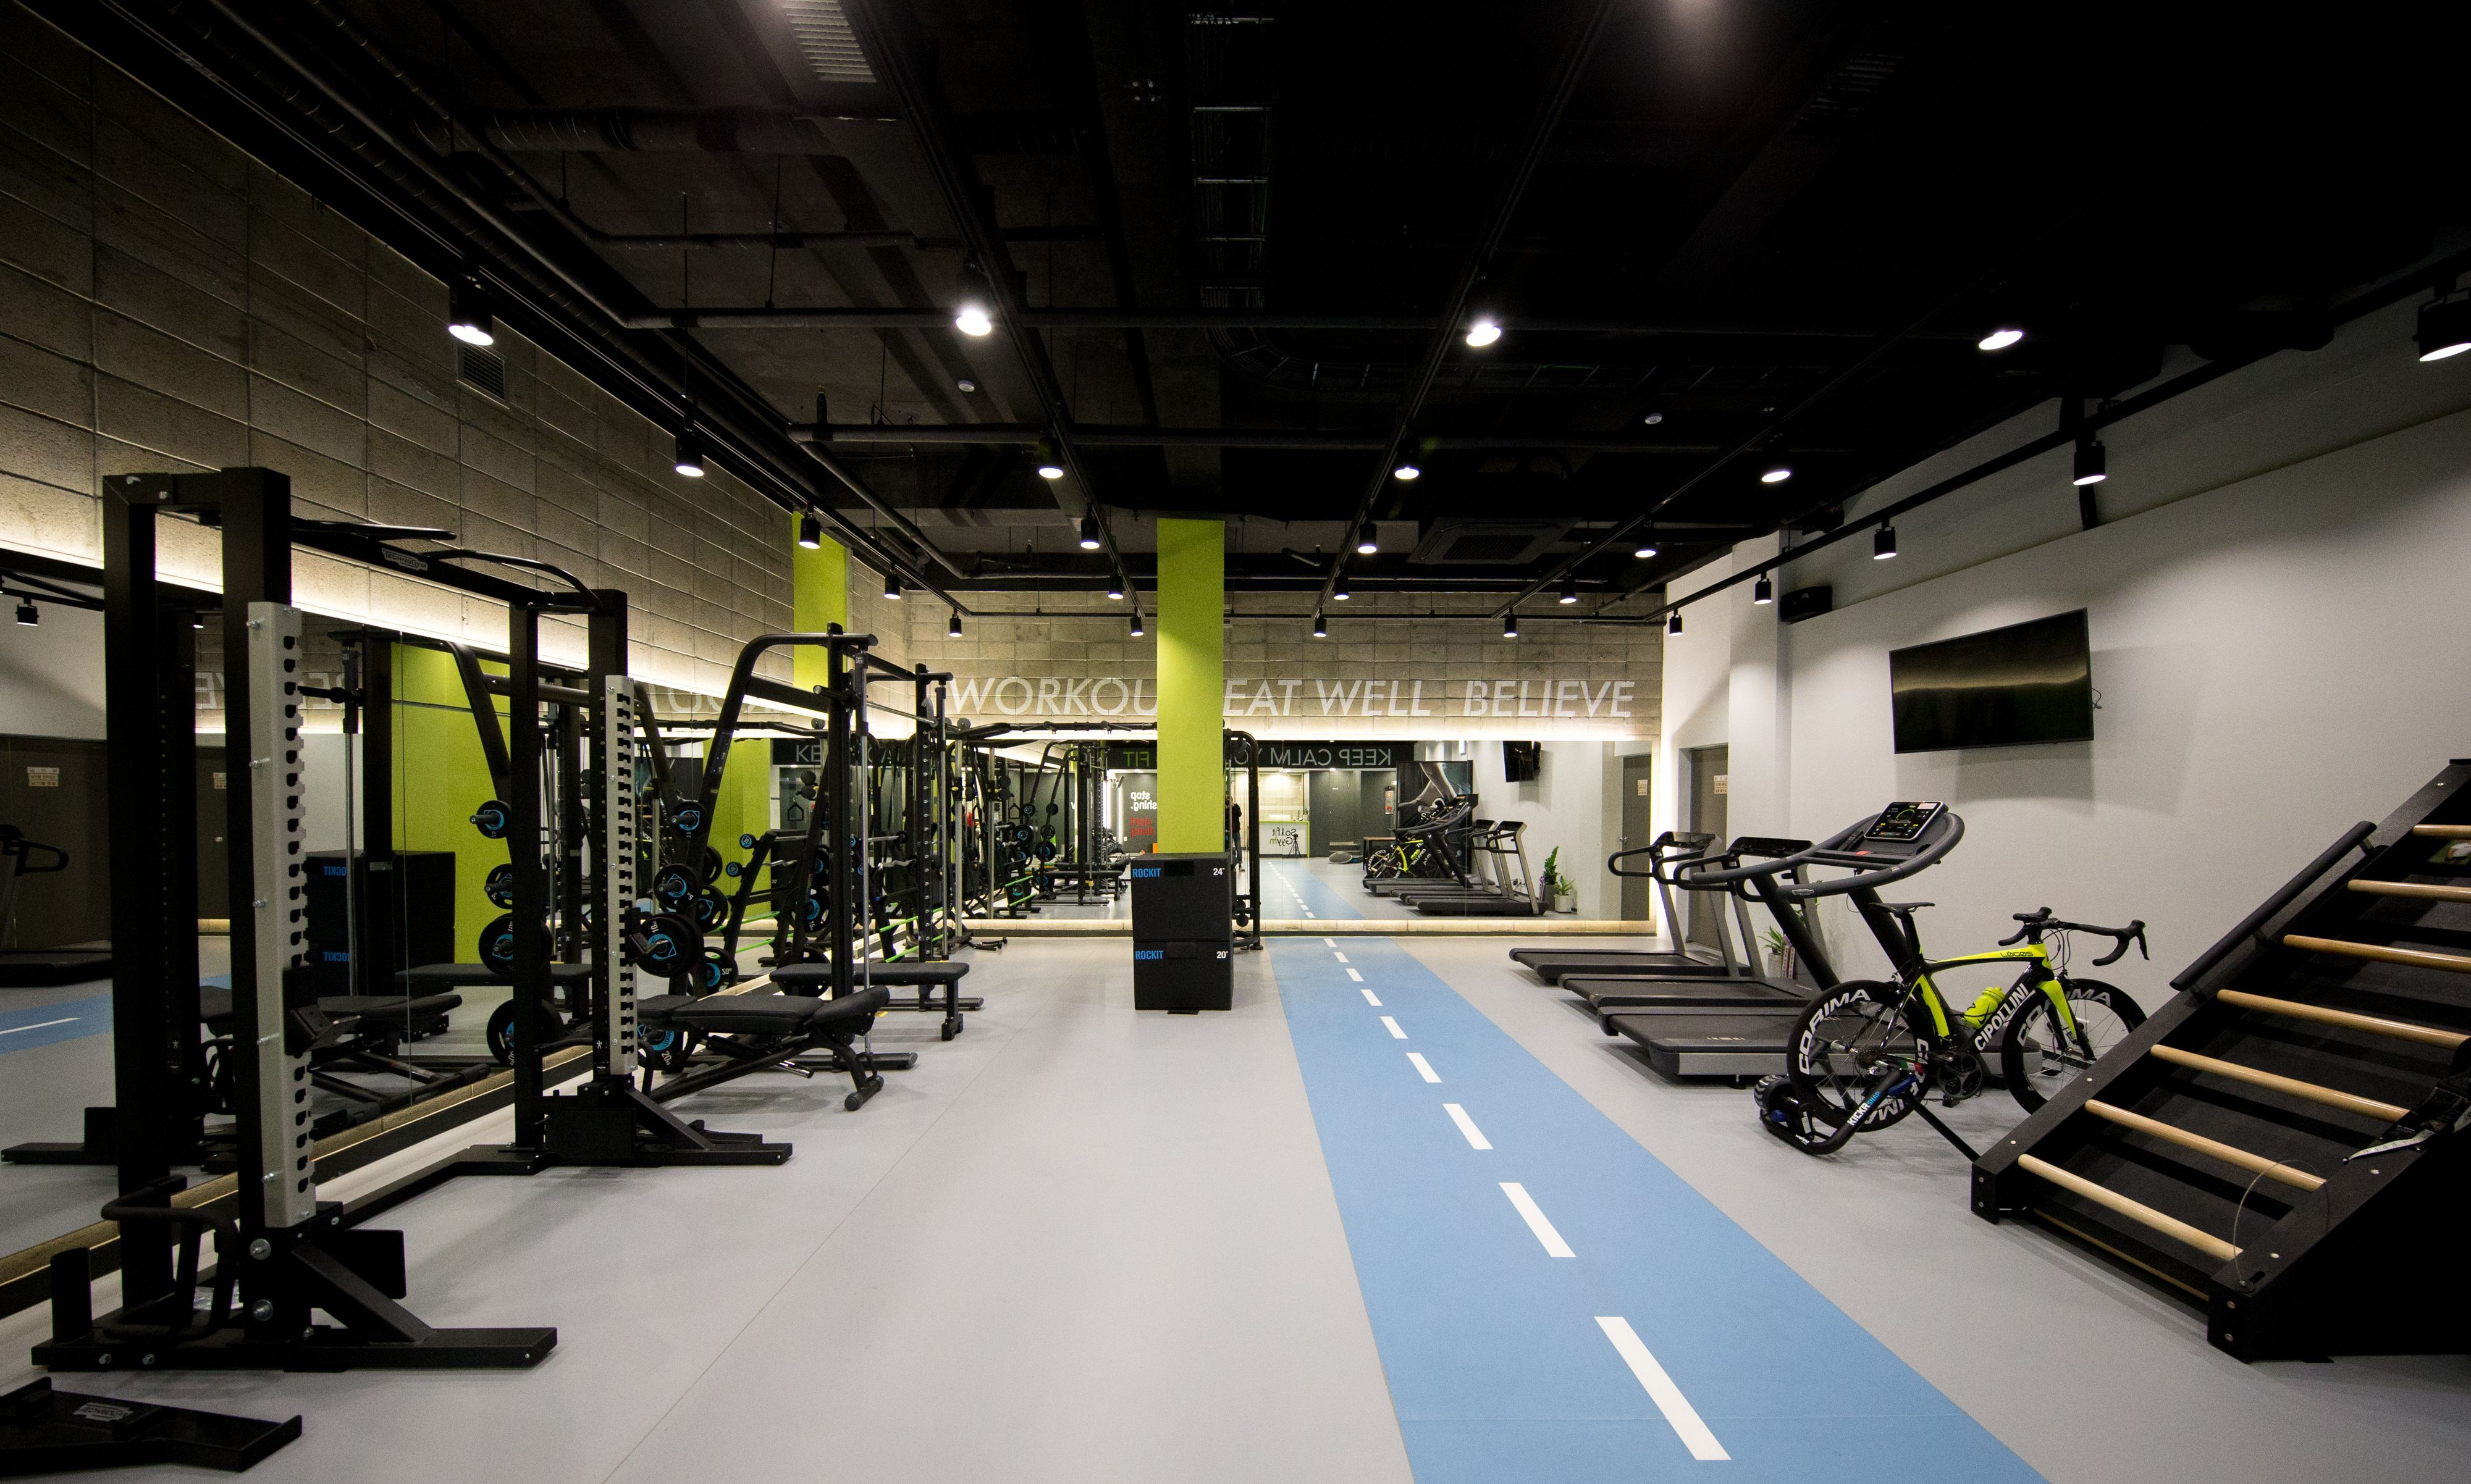 10 Plus Luxury Workout Room Flooring Workout Room Flooring Gym